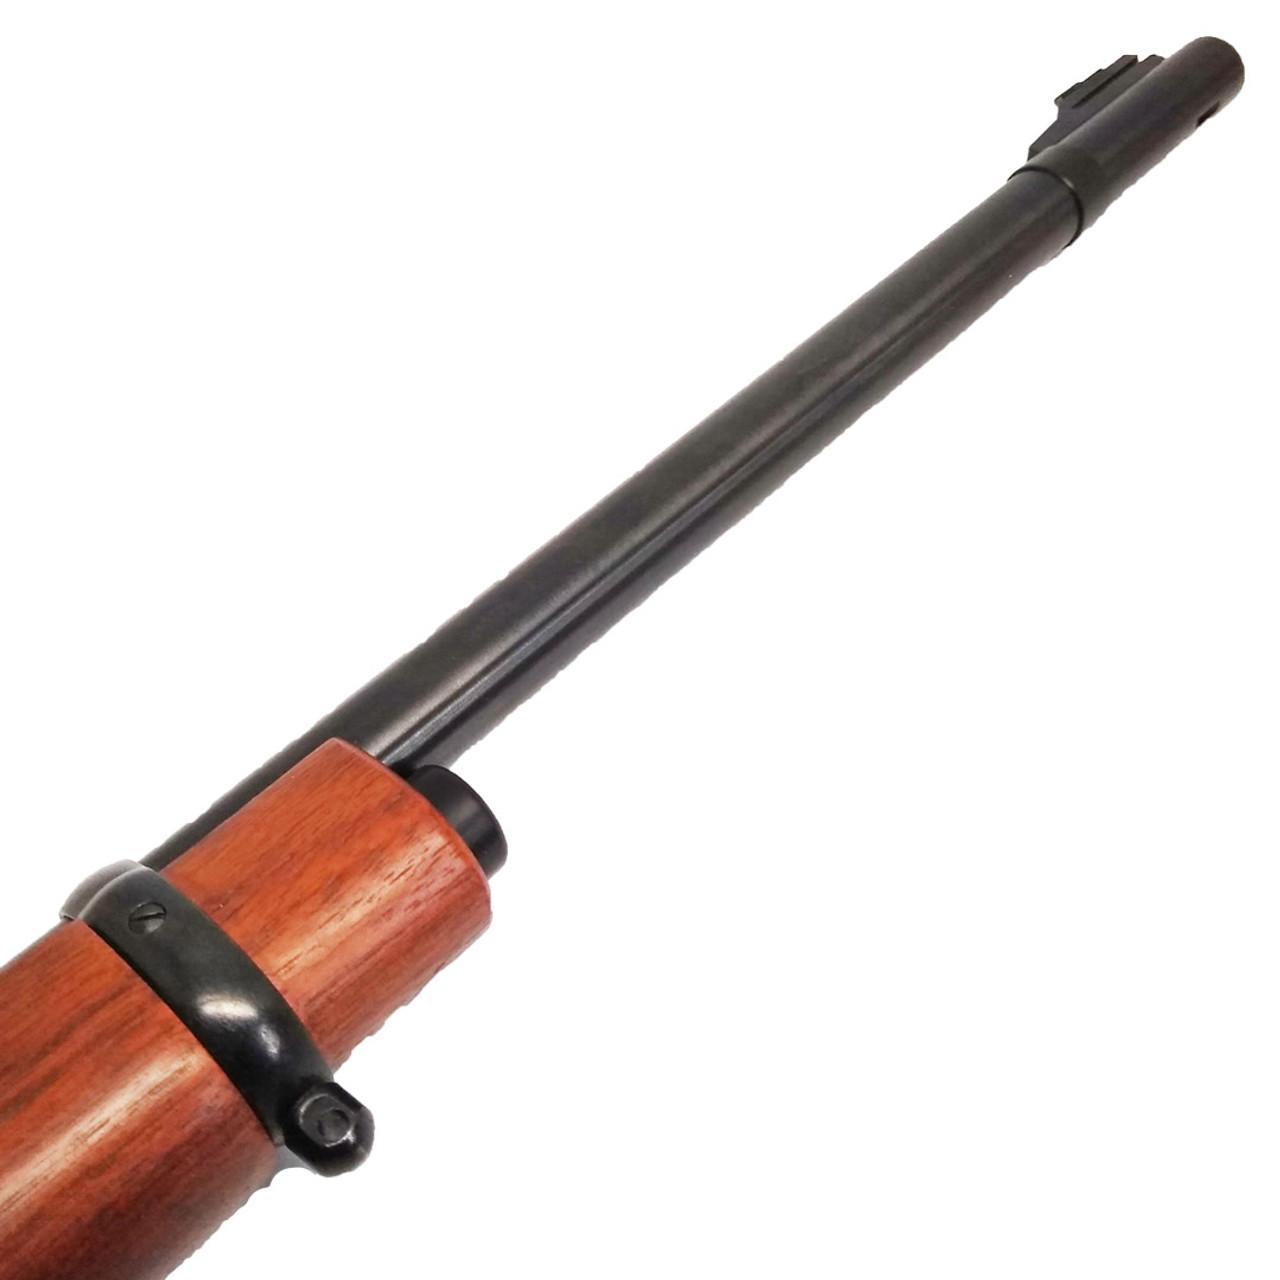 marlin 336 30-30 35 Rem magazine tube ranger point precision